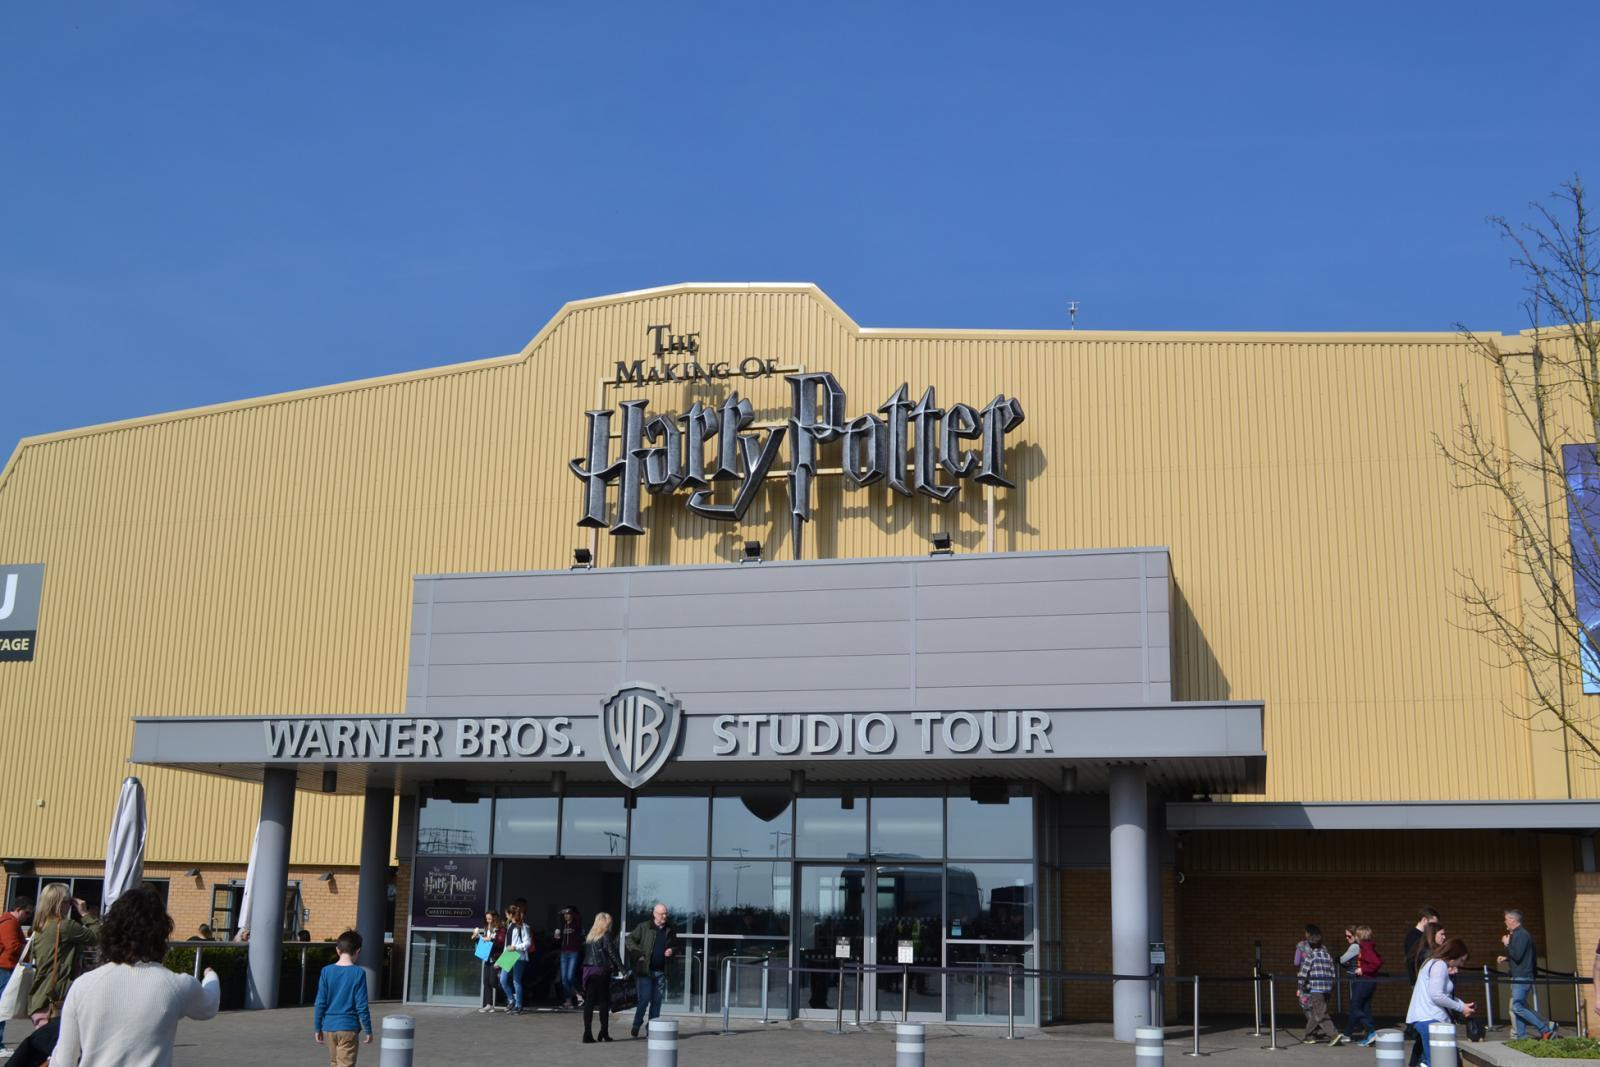 Der Eingang der Harry Potter Warner Bros. Studio Tour